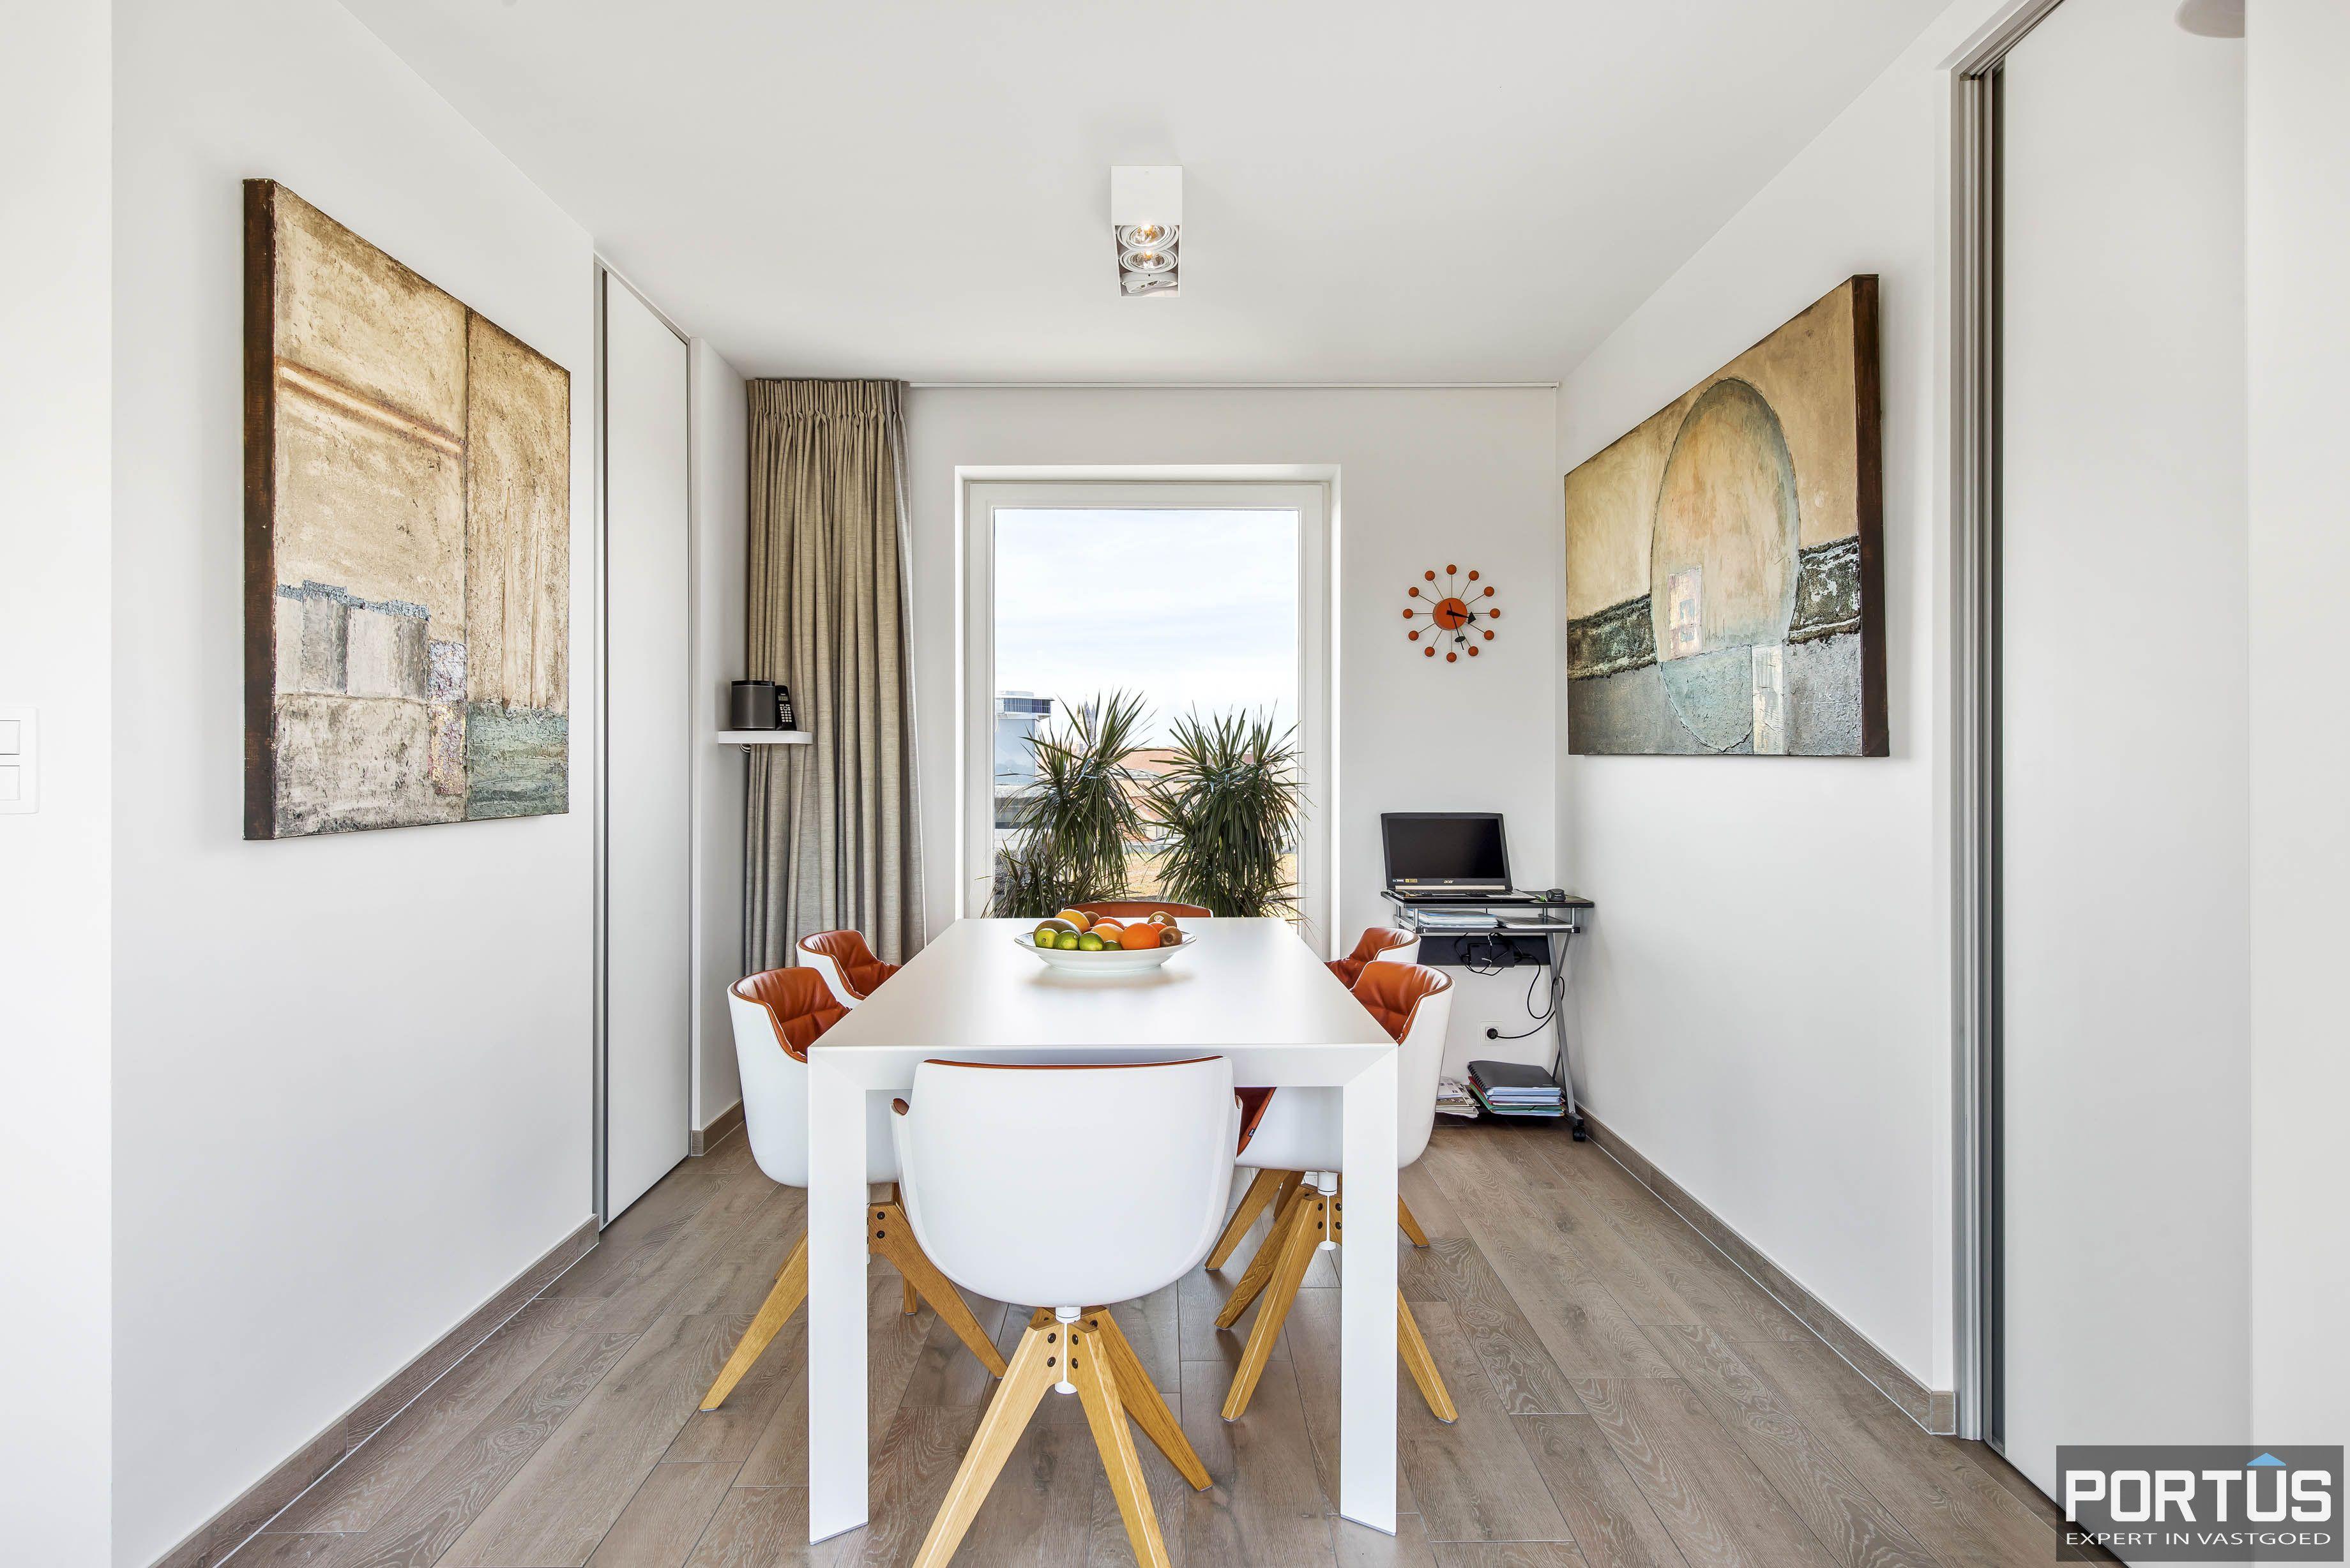 Exclusieve penthouse met 3 slaapkamers te koop te Nieuwpoort - 10943